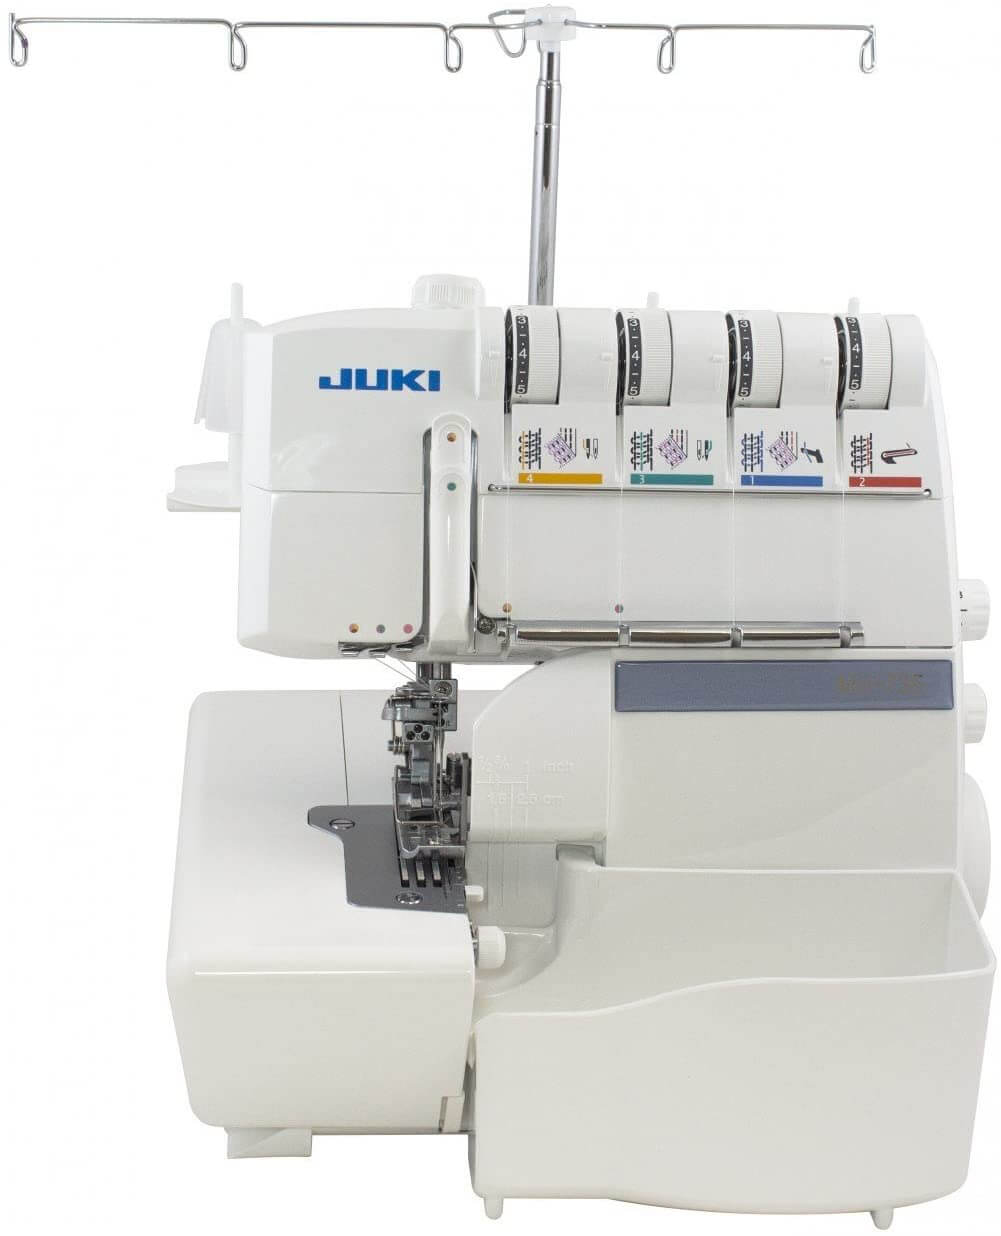 Juki MO-735 5-Thread Serger and Cover Hem